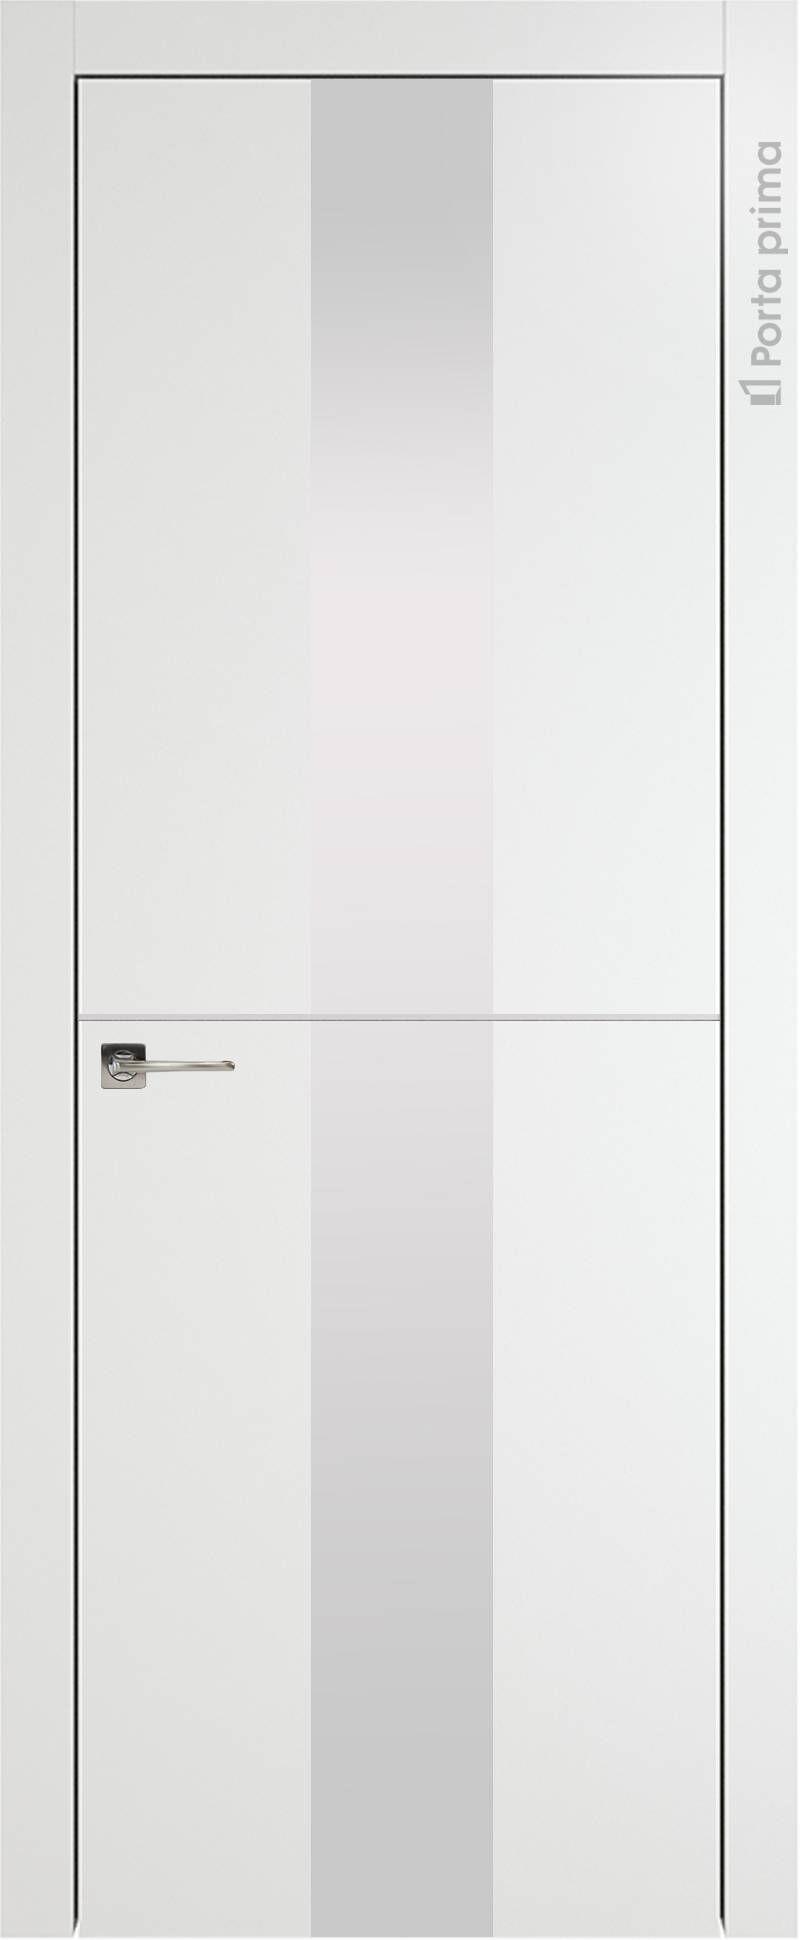 Tivoli Ж-3 цвет - Белая эмаль (RAL 9003) Со стеклом (ДО)